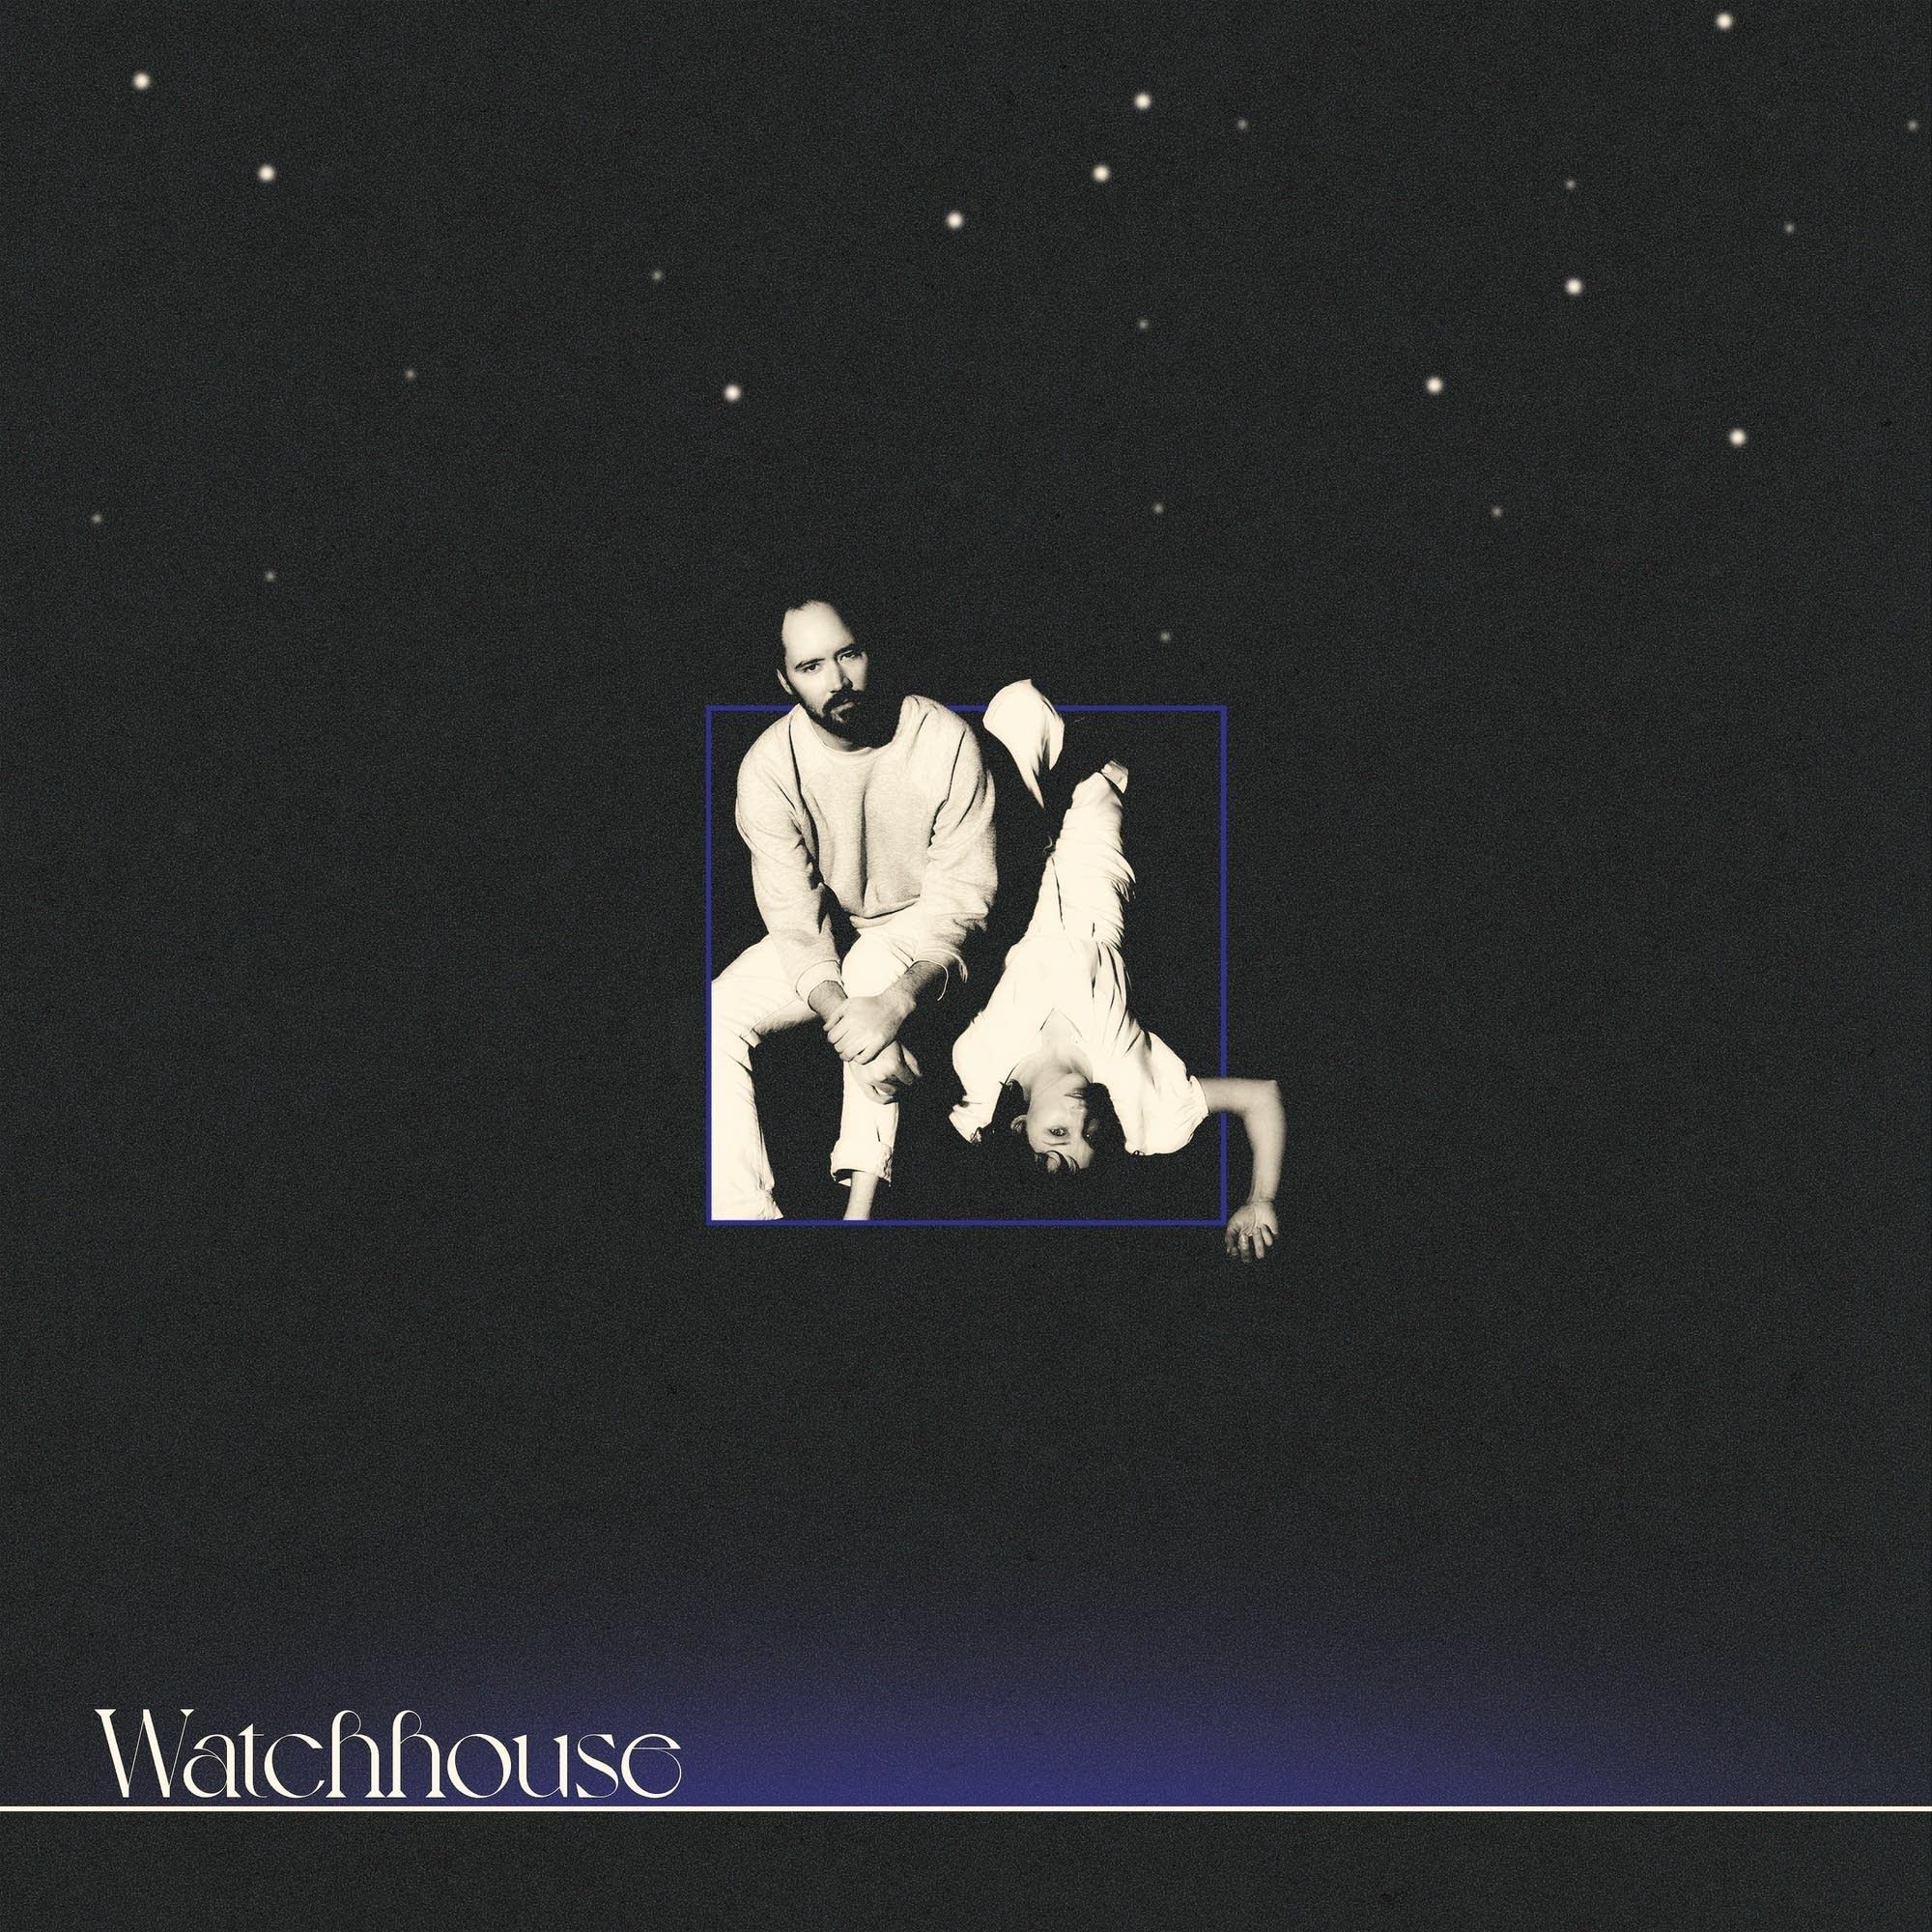 Watchhouse self-titled album